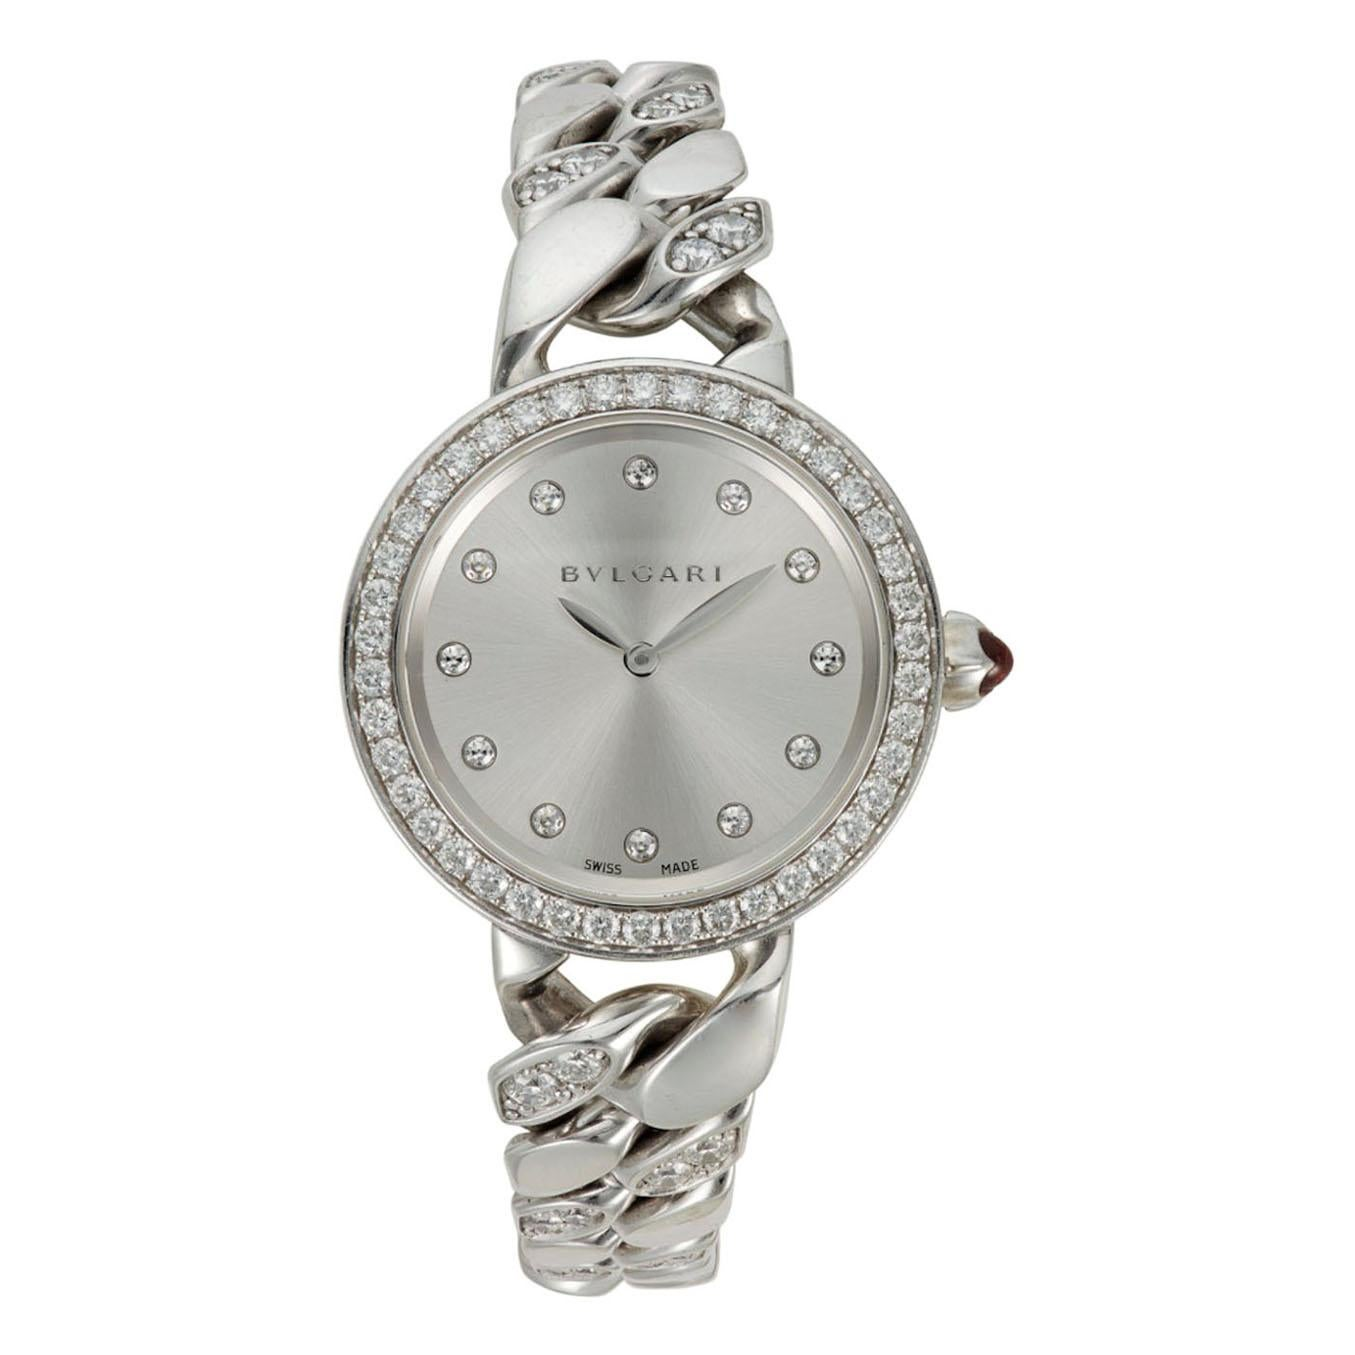 "Bulgari ""Catene"" 18k White Gold and Diamond Bracelet Bvlgari Wristwatch"